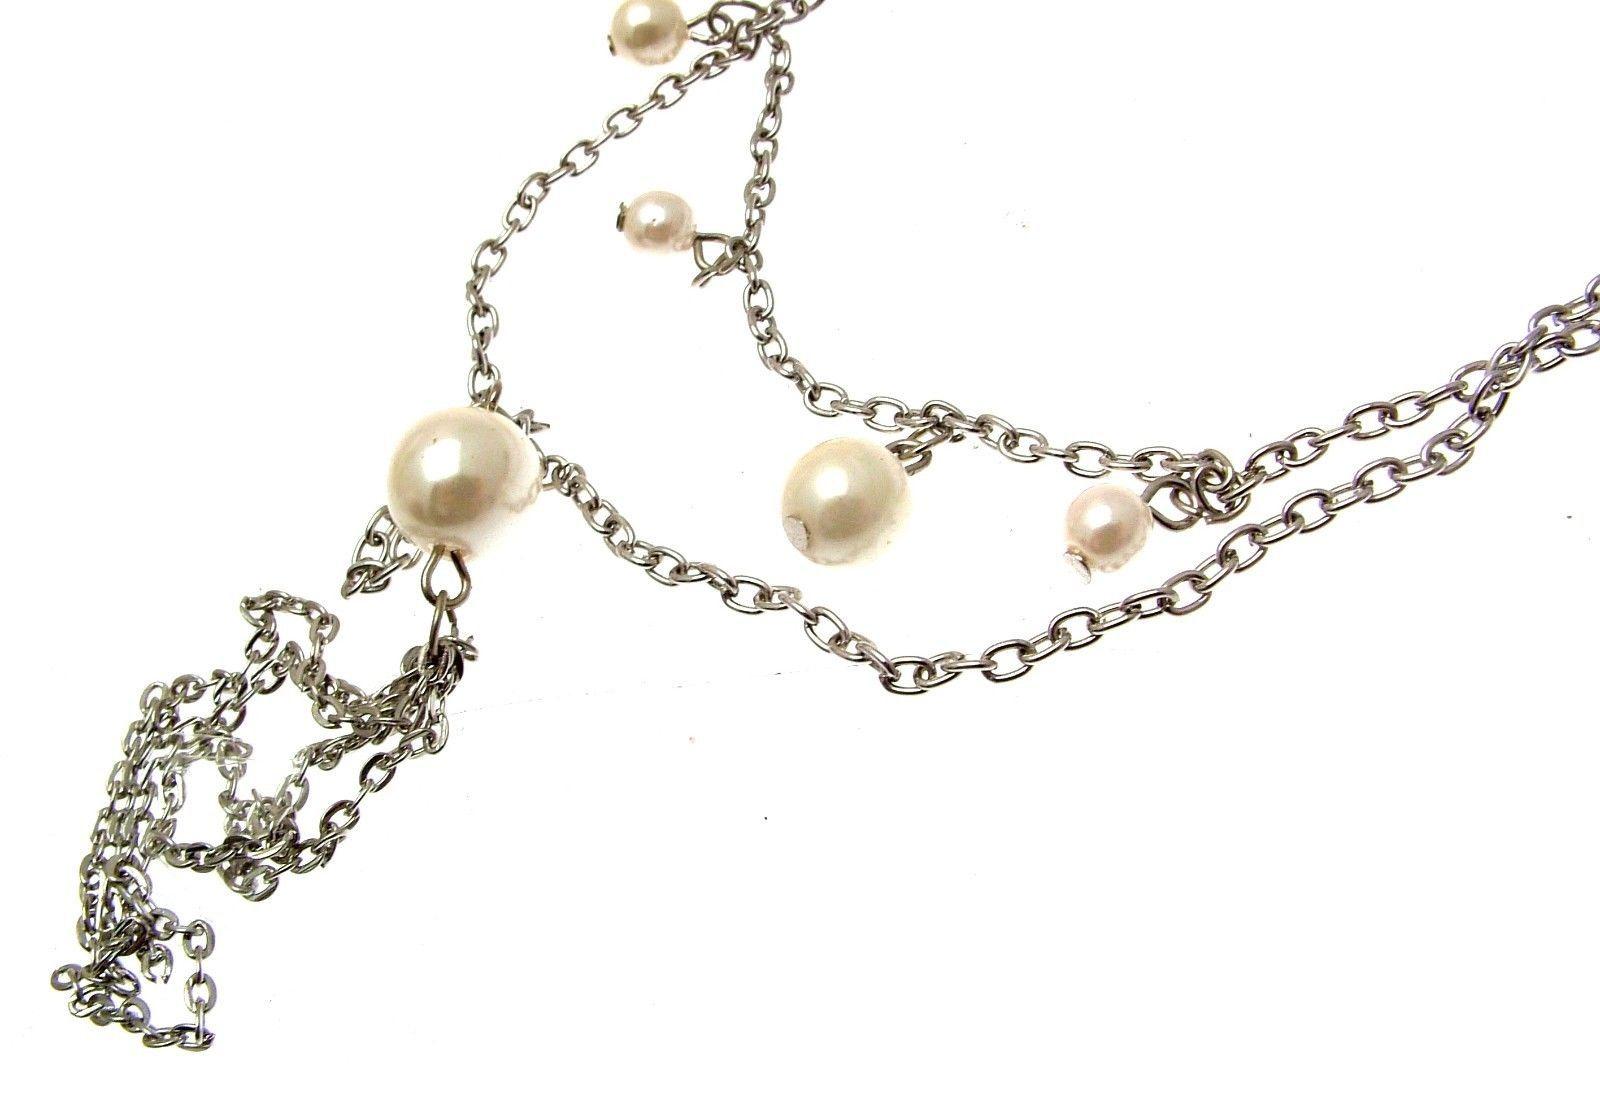 Necklaces For Women Statement Necklaces Faux Pearl Necklaces